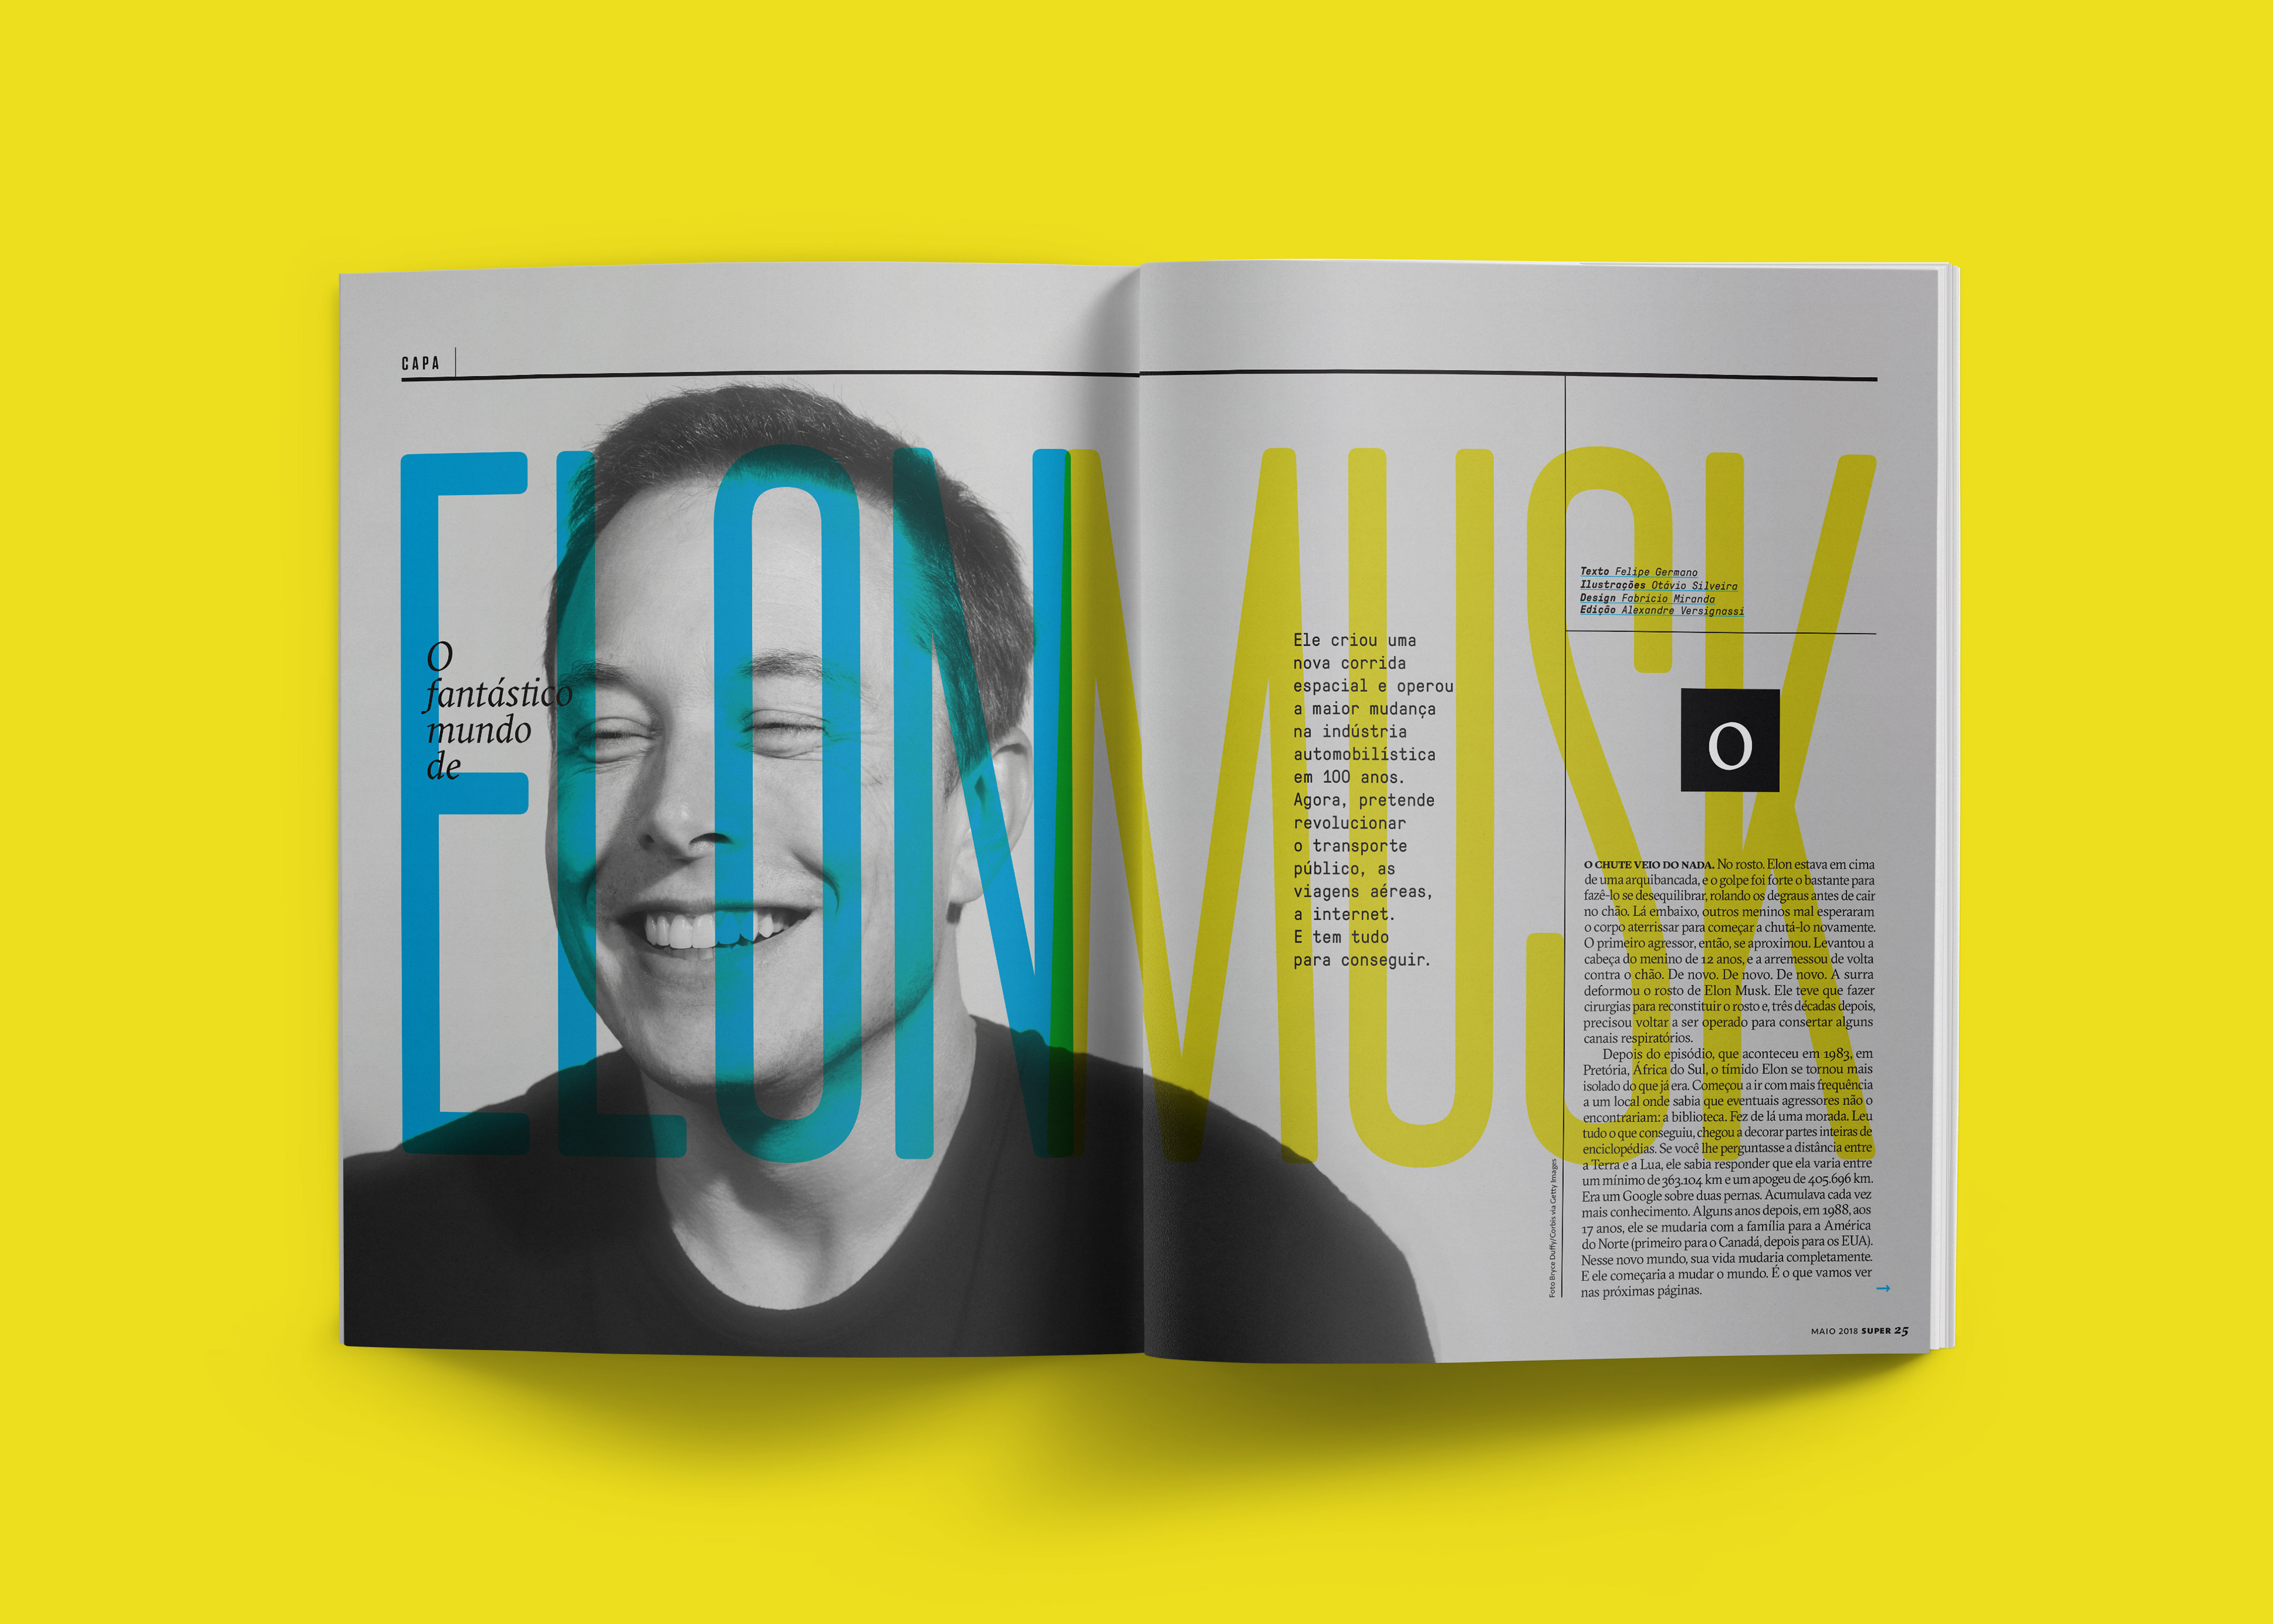 Fabricio Miranda - The Fantastic World of Elon Musk